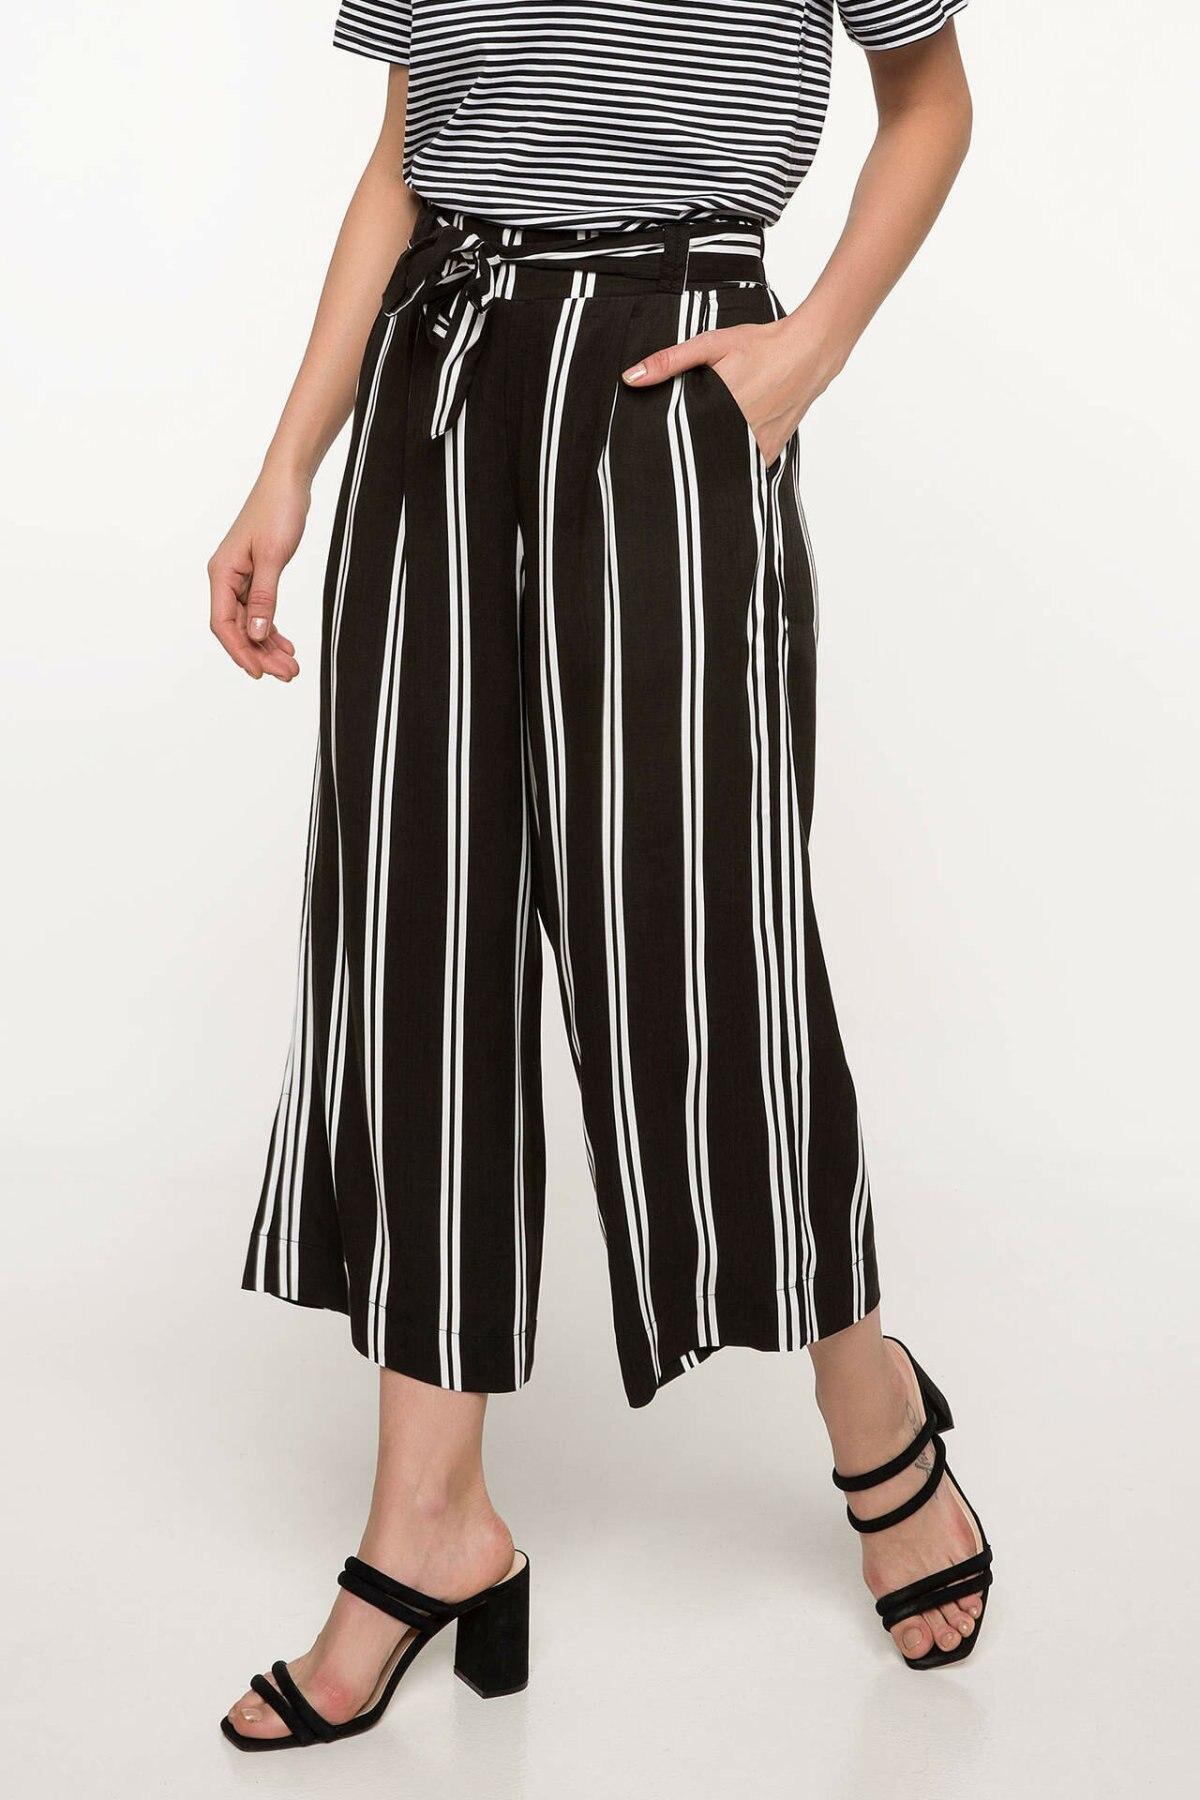 DeFacto Fashion Woman Elegant Trousers Female Striped Wide-leg Crop Pants Ladies Casual Belts Comfort Spring - I7722AZ18SM